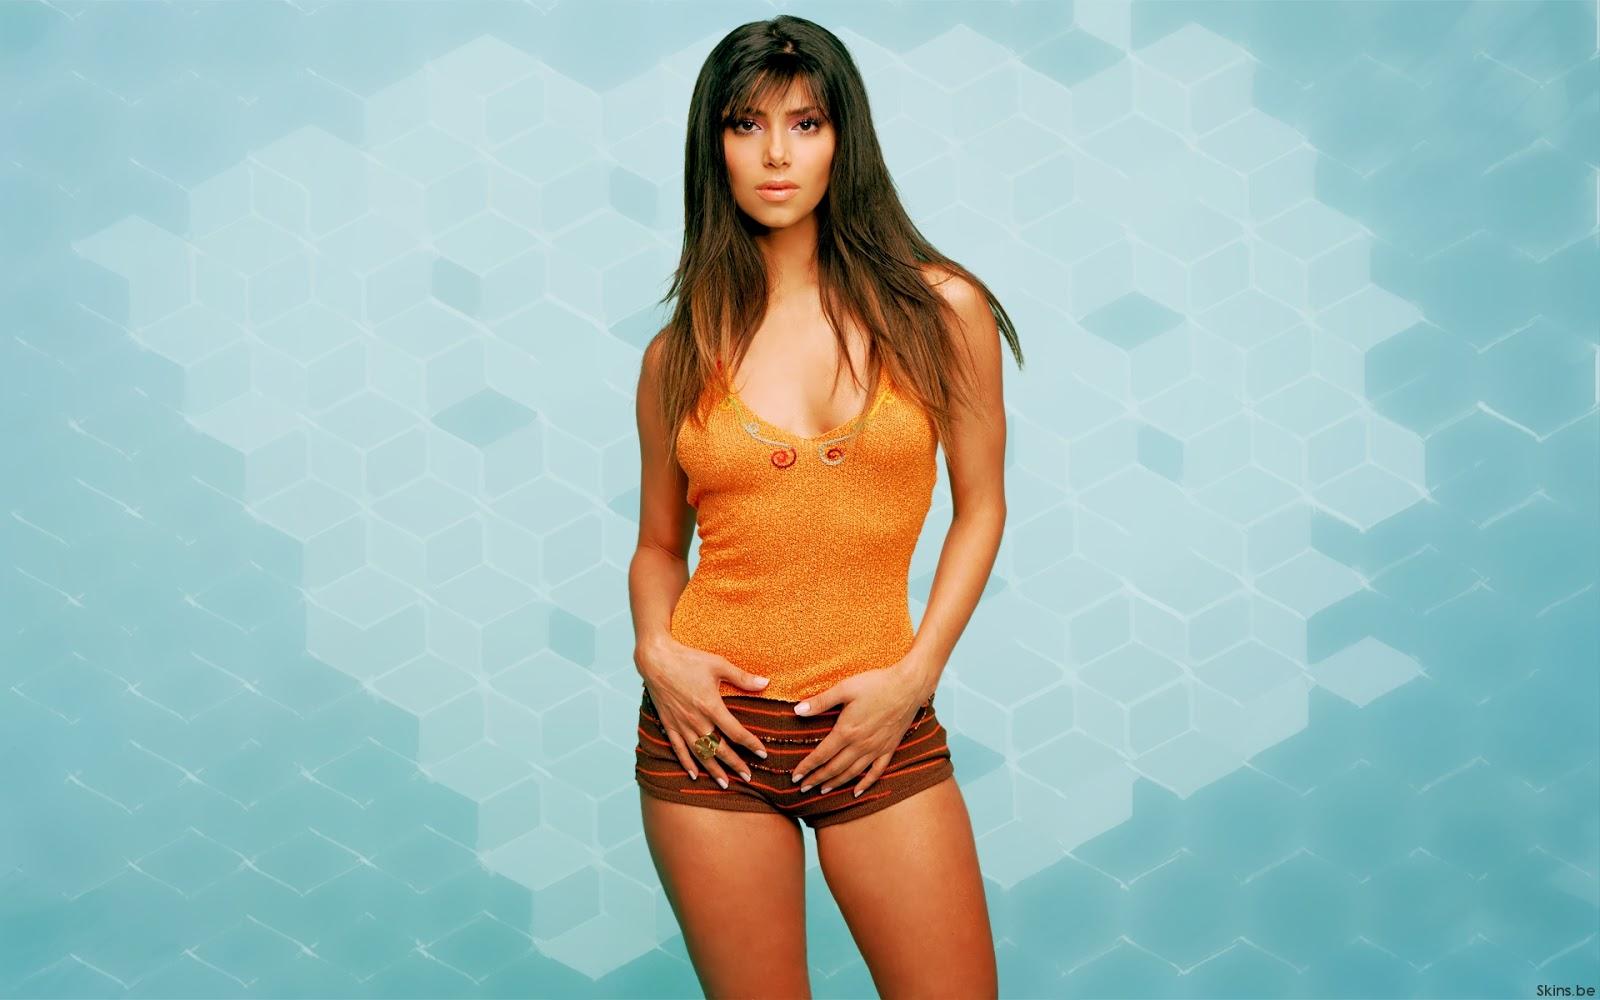 roselyn sanchez - Celeb Images 6 Monica Bellucci Dating